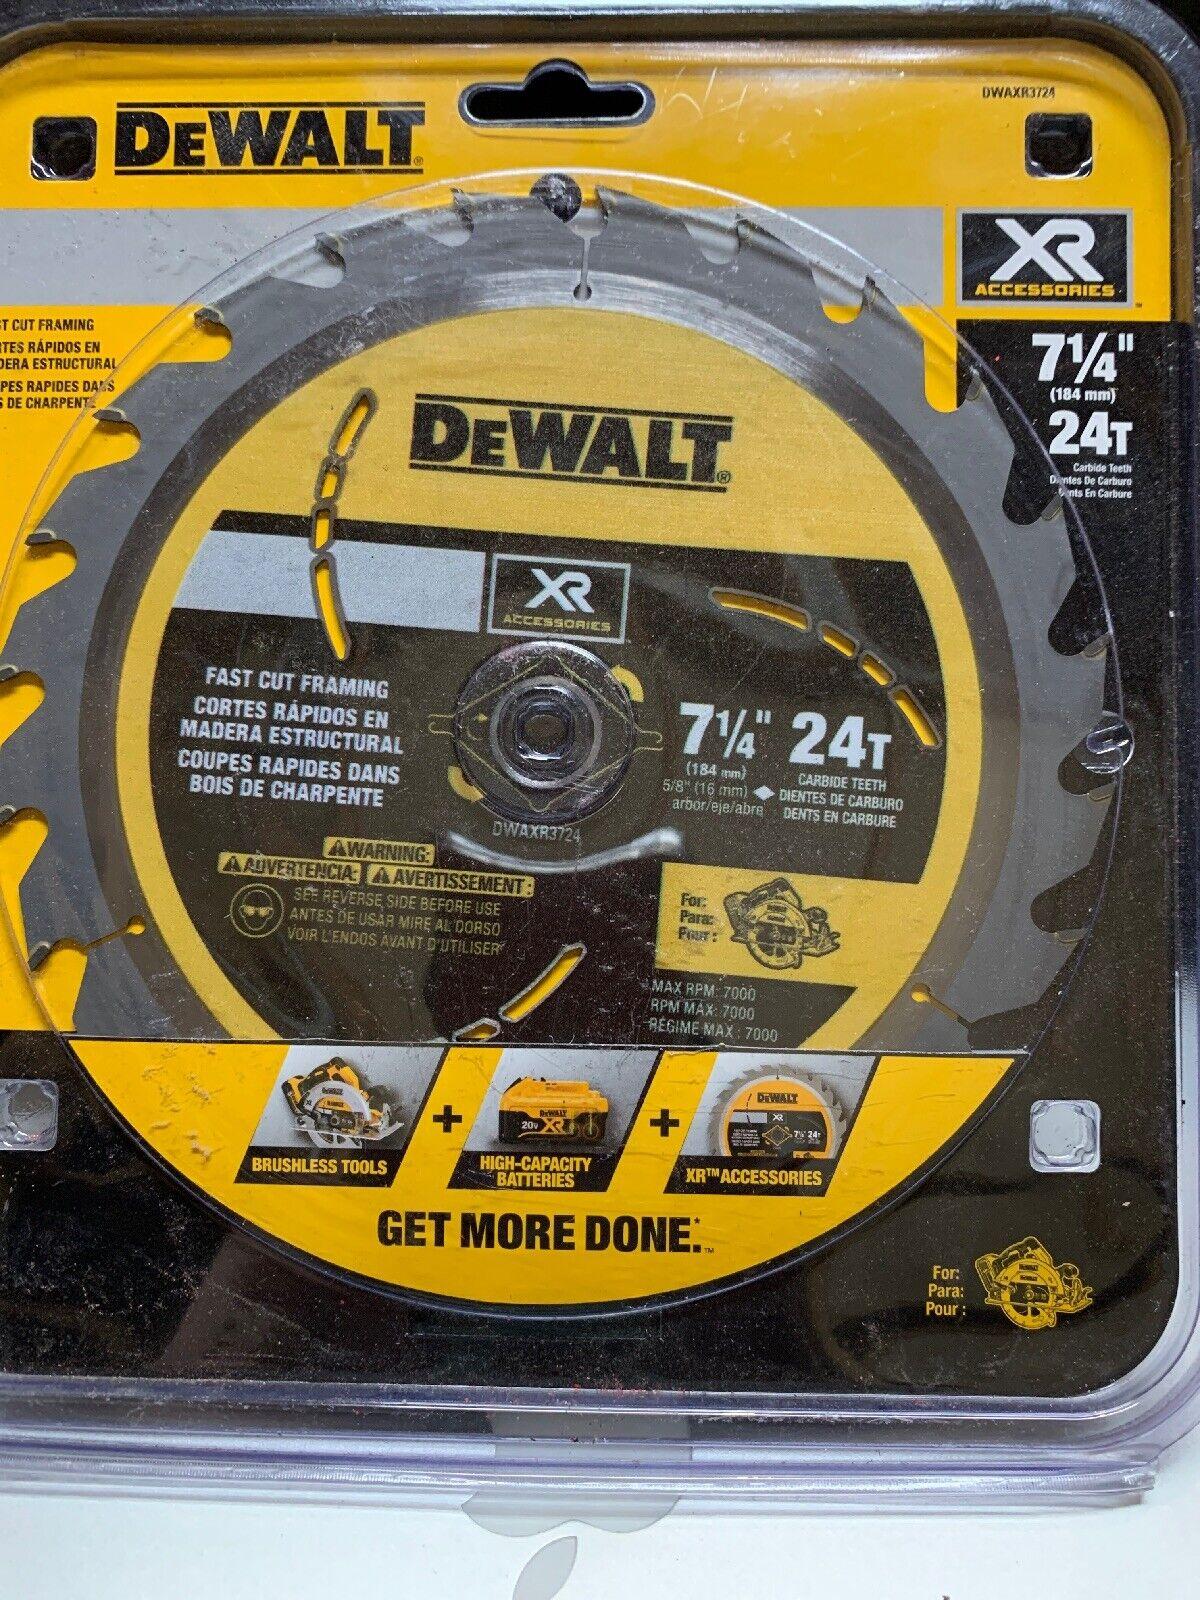 DEWALT XR 7-1 4-in 24-Tooth Framing Carbide Circular Saw Blade Lot Of 11 Blades